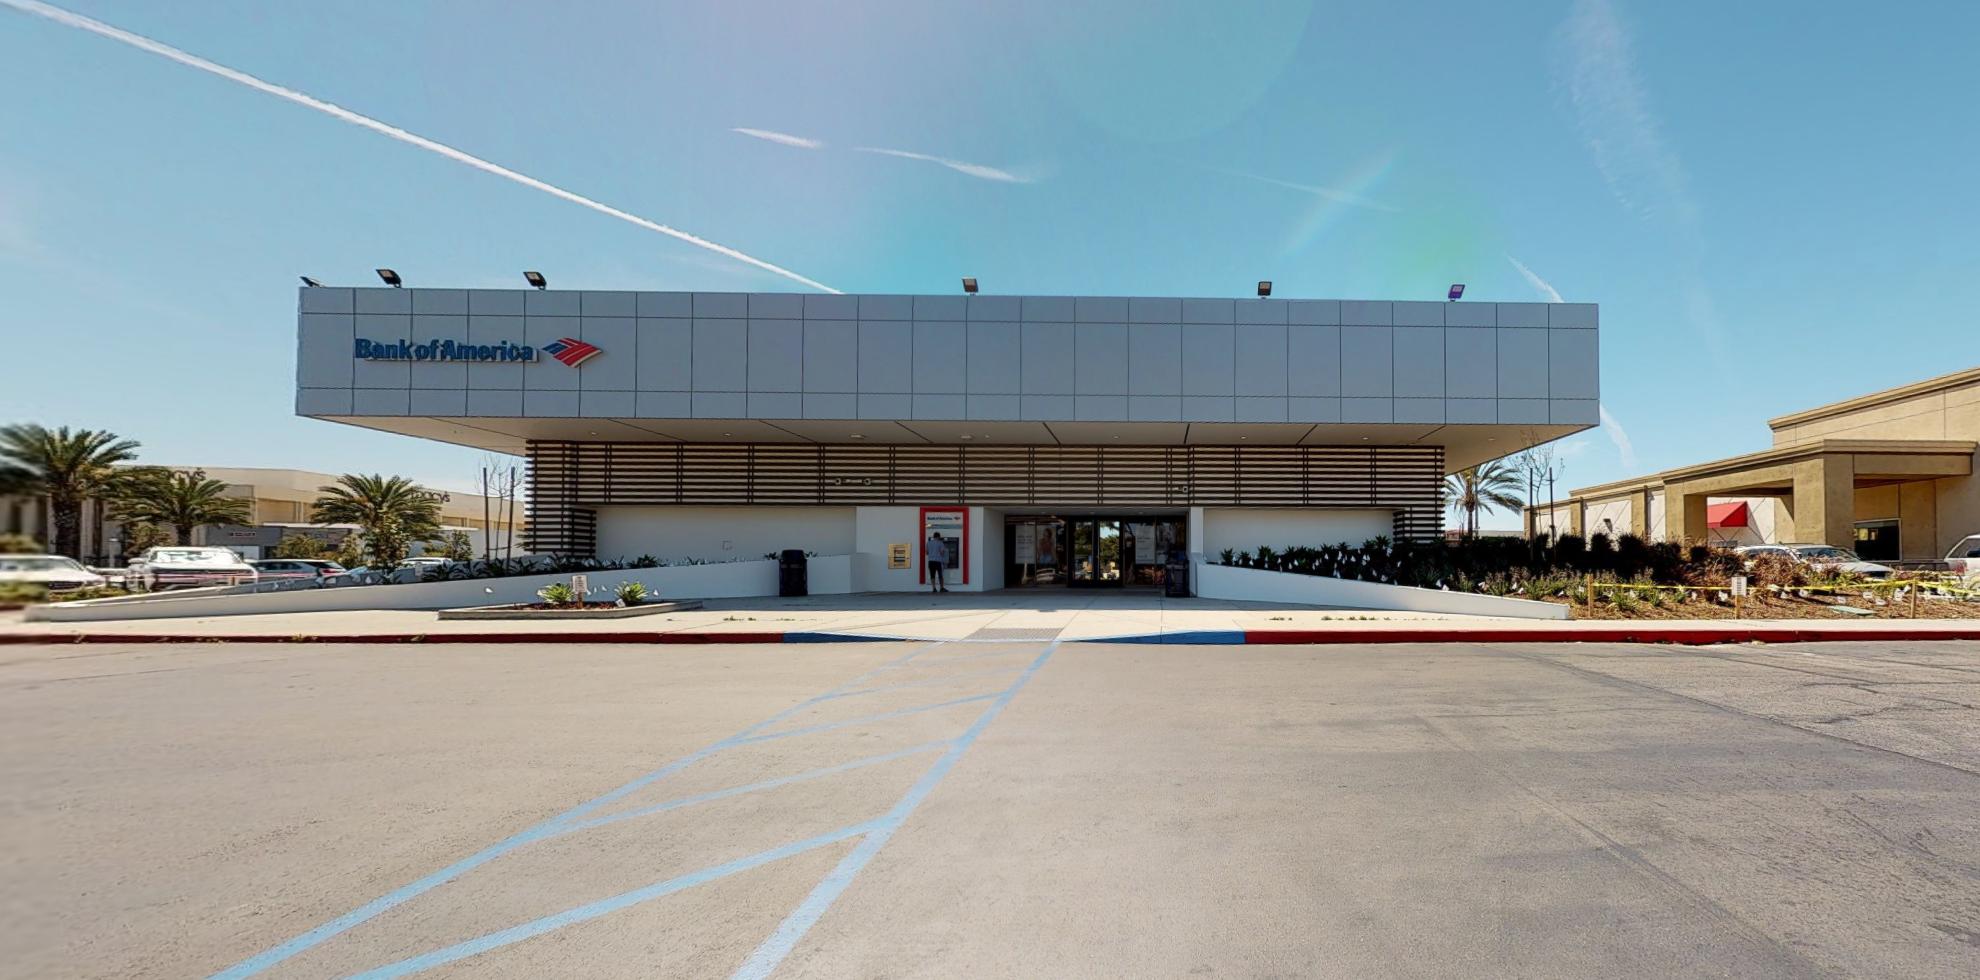 Bank of America financial center with drive-thru ATM | 18641 S Gridley Rd, Cerritos, CA 90703